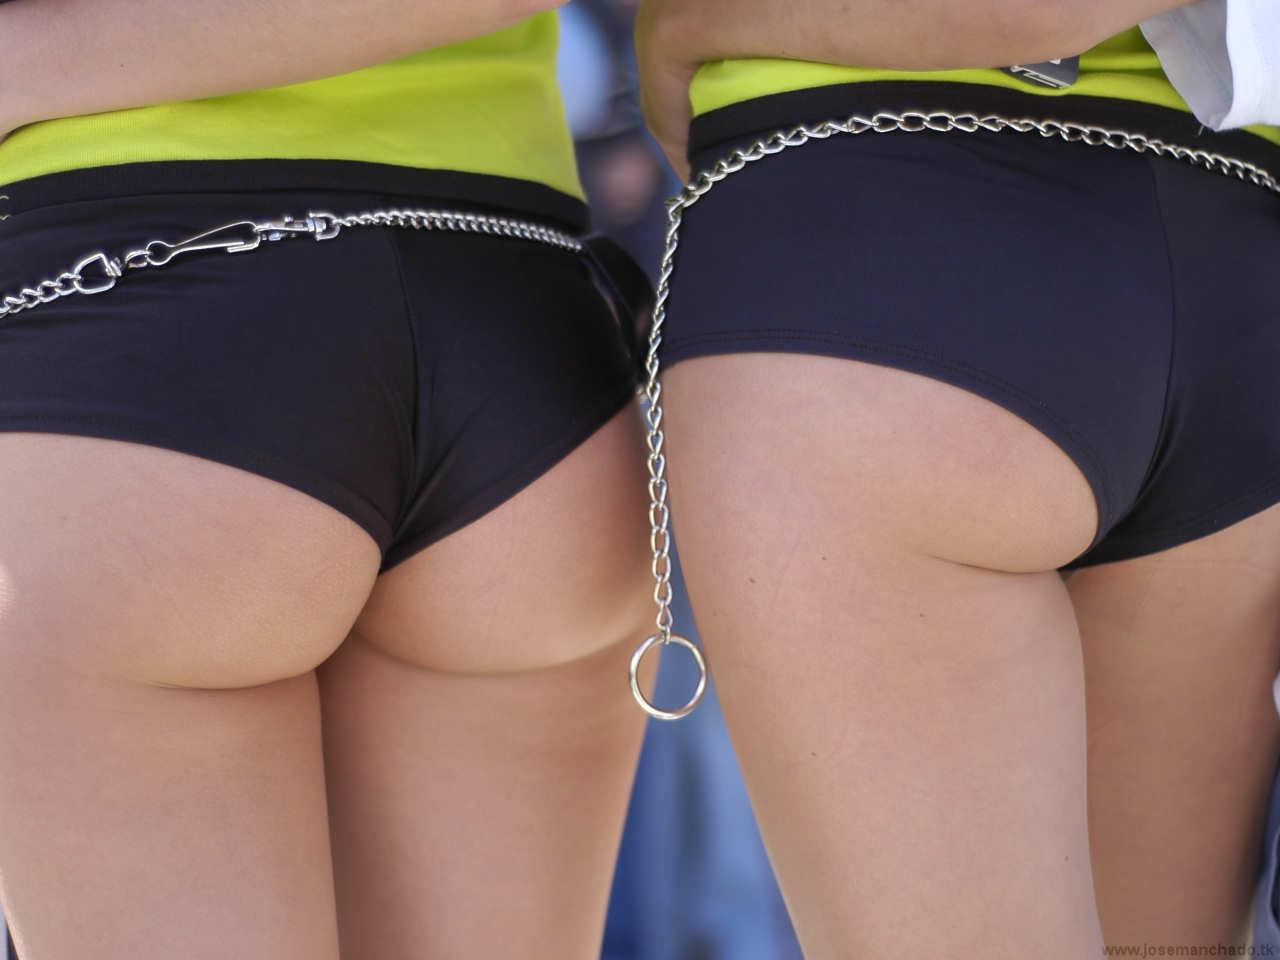 2 female ass by josemanchado